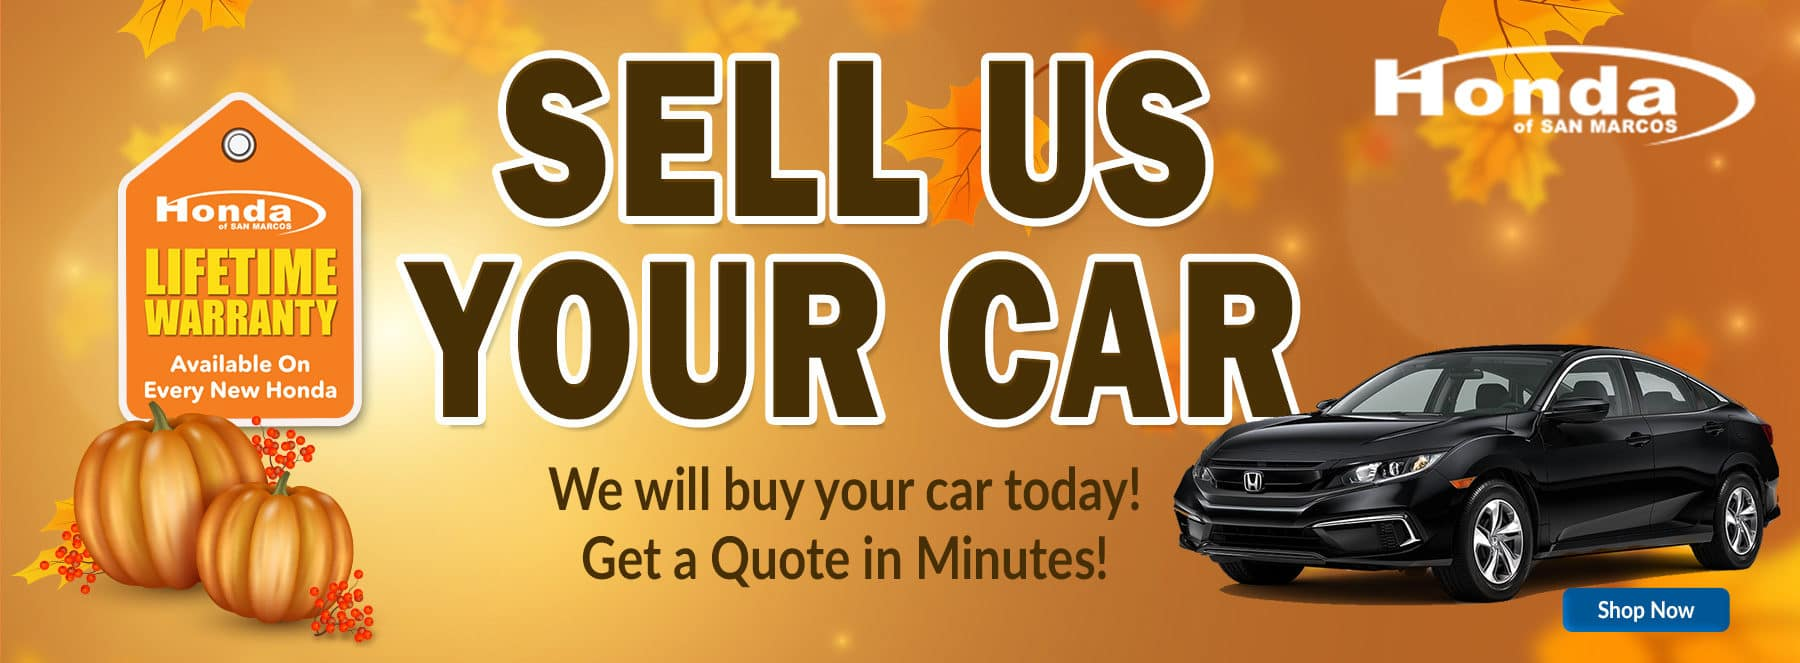 Honda San Marcos Sell Us Your Car